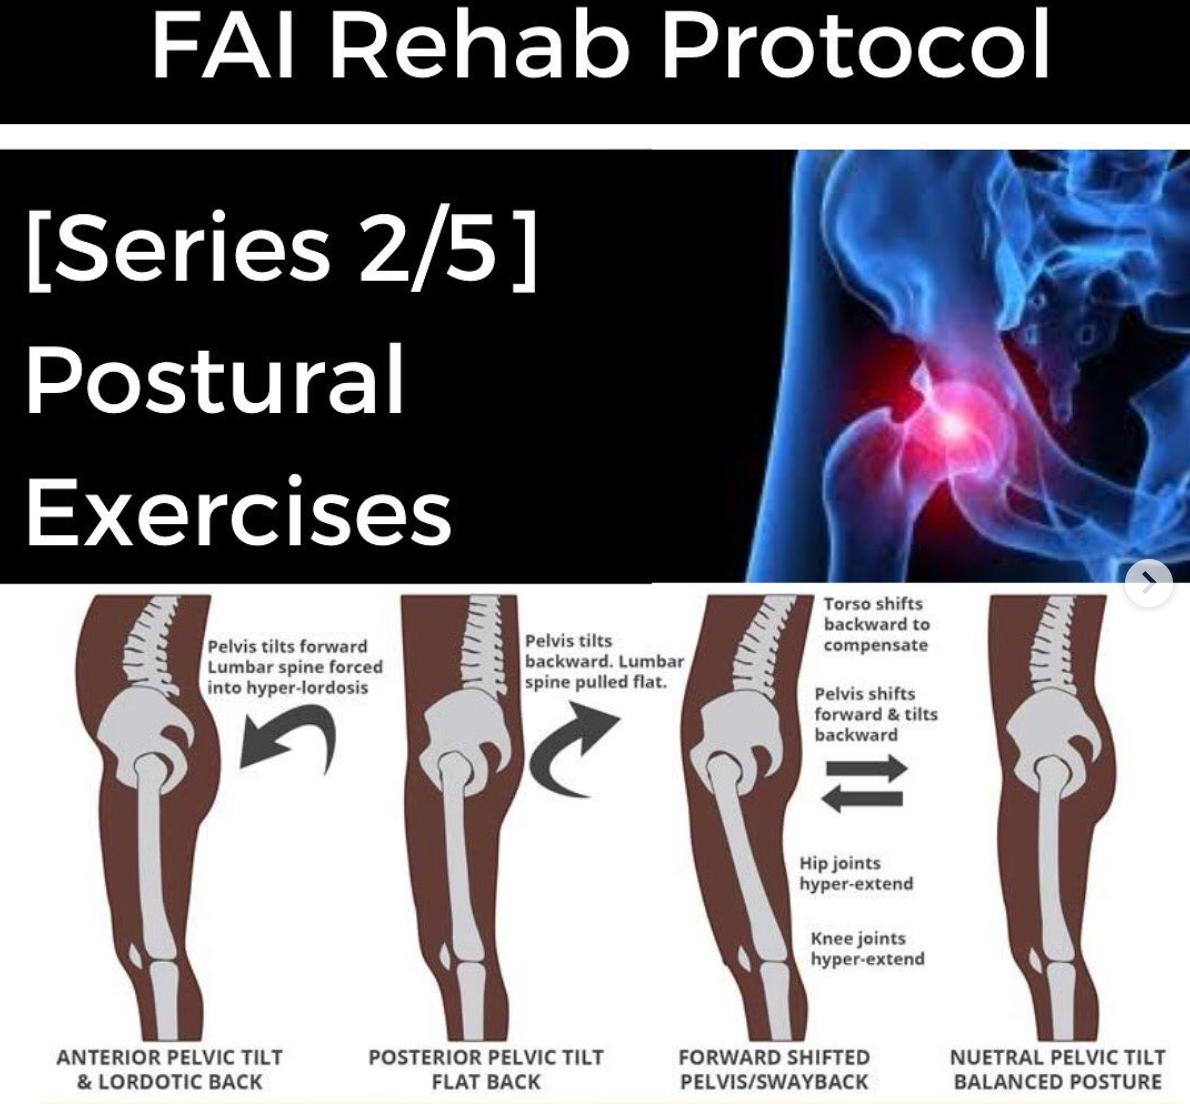 FAI Rehab Protocol Part 2 - Postural Exercises - themanualtherapist.com